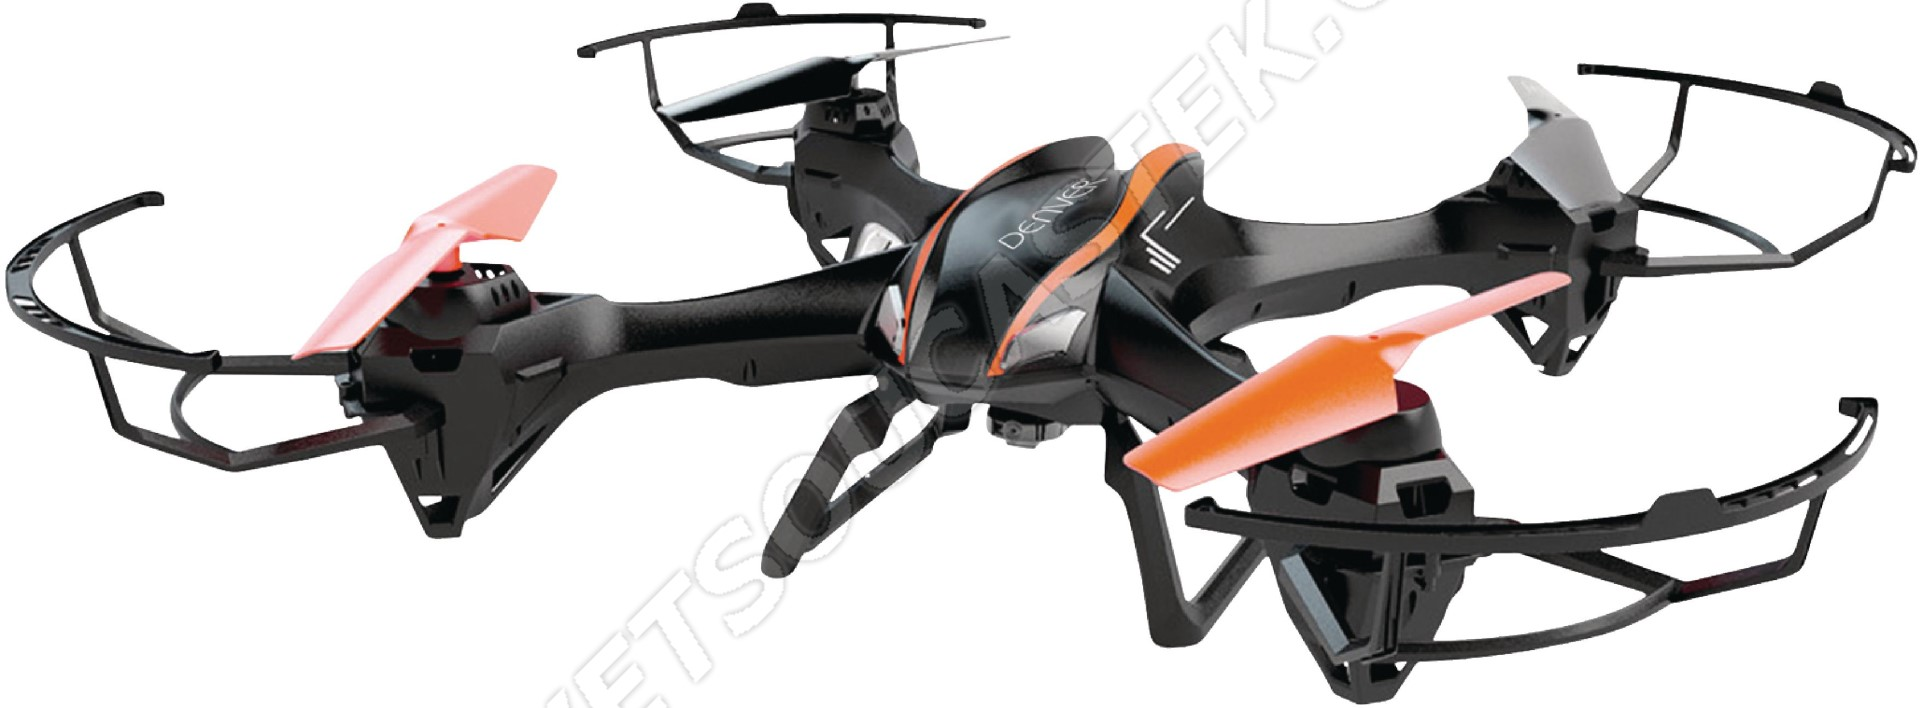 Kvadkoptéra (dron) s vestavěnou HD kamerou 2.4GHz dosah 80m Denver DV-DCH-600